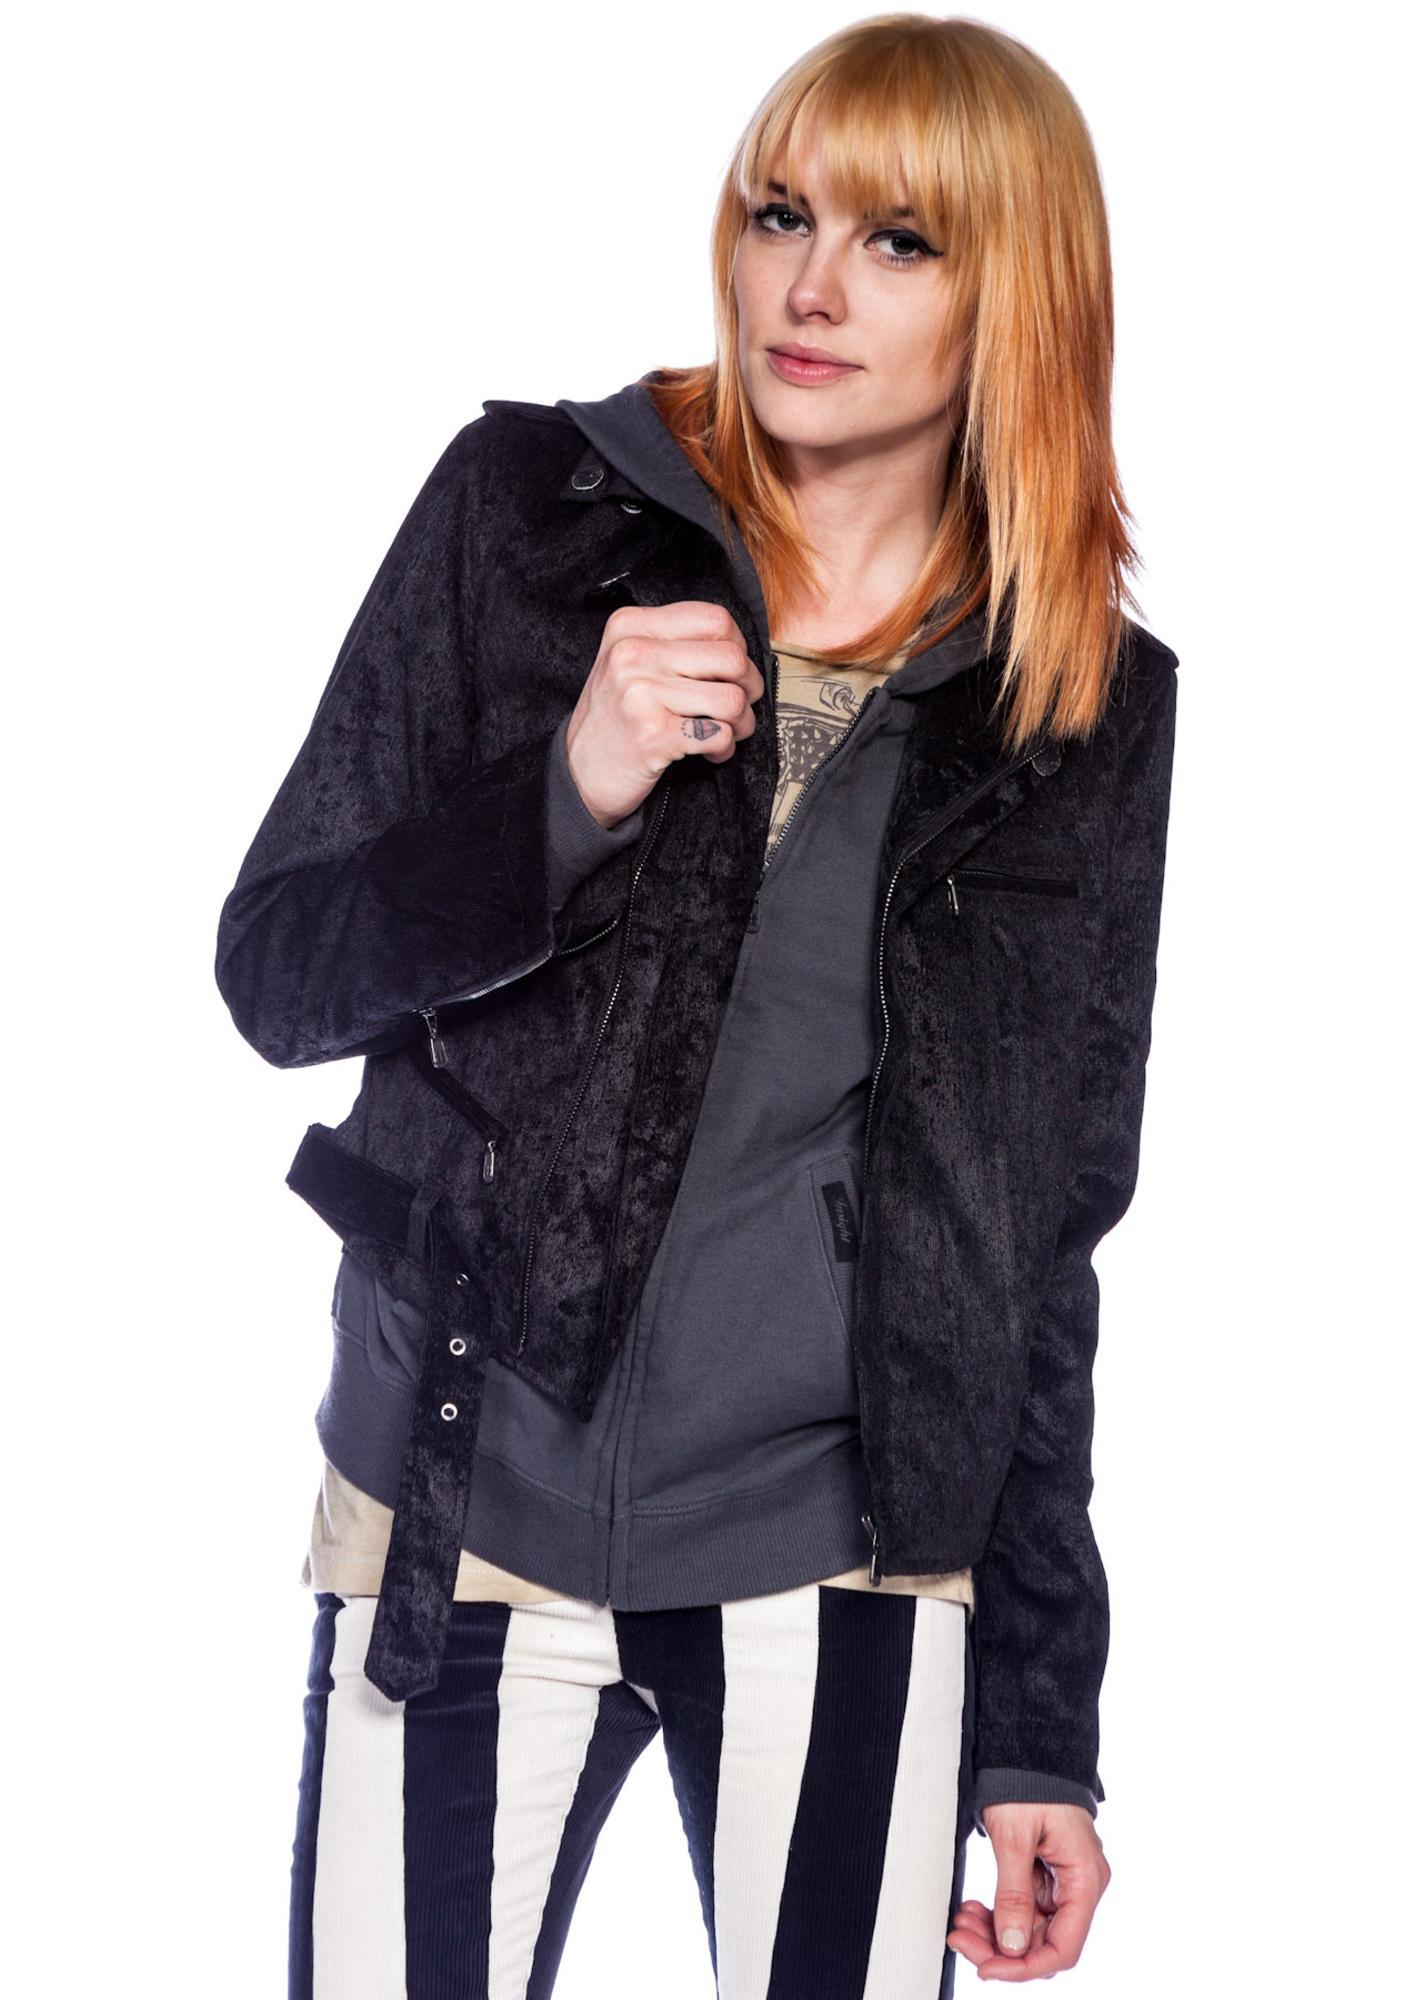 Insight Wanderer Jacket